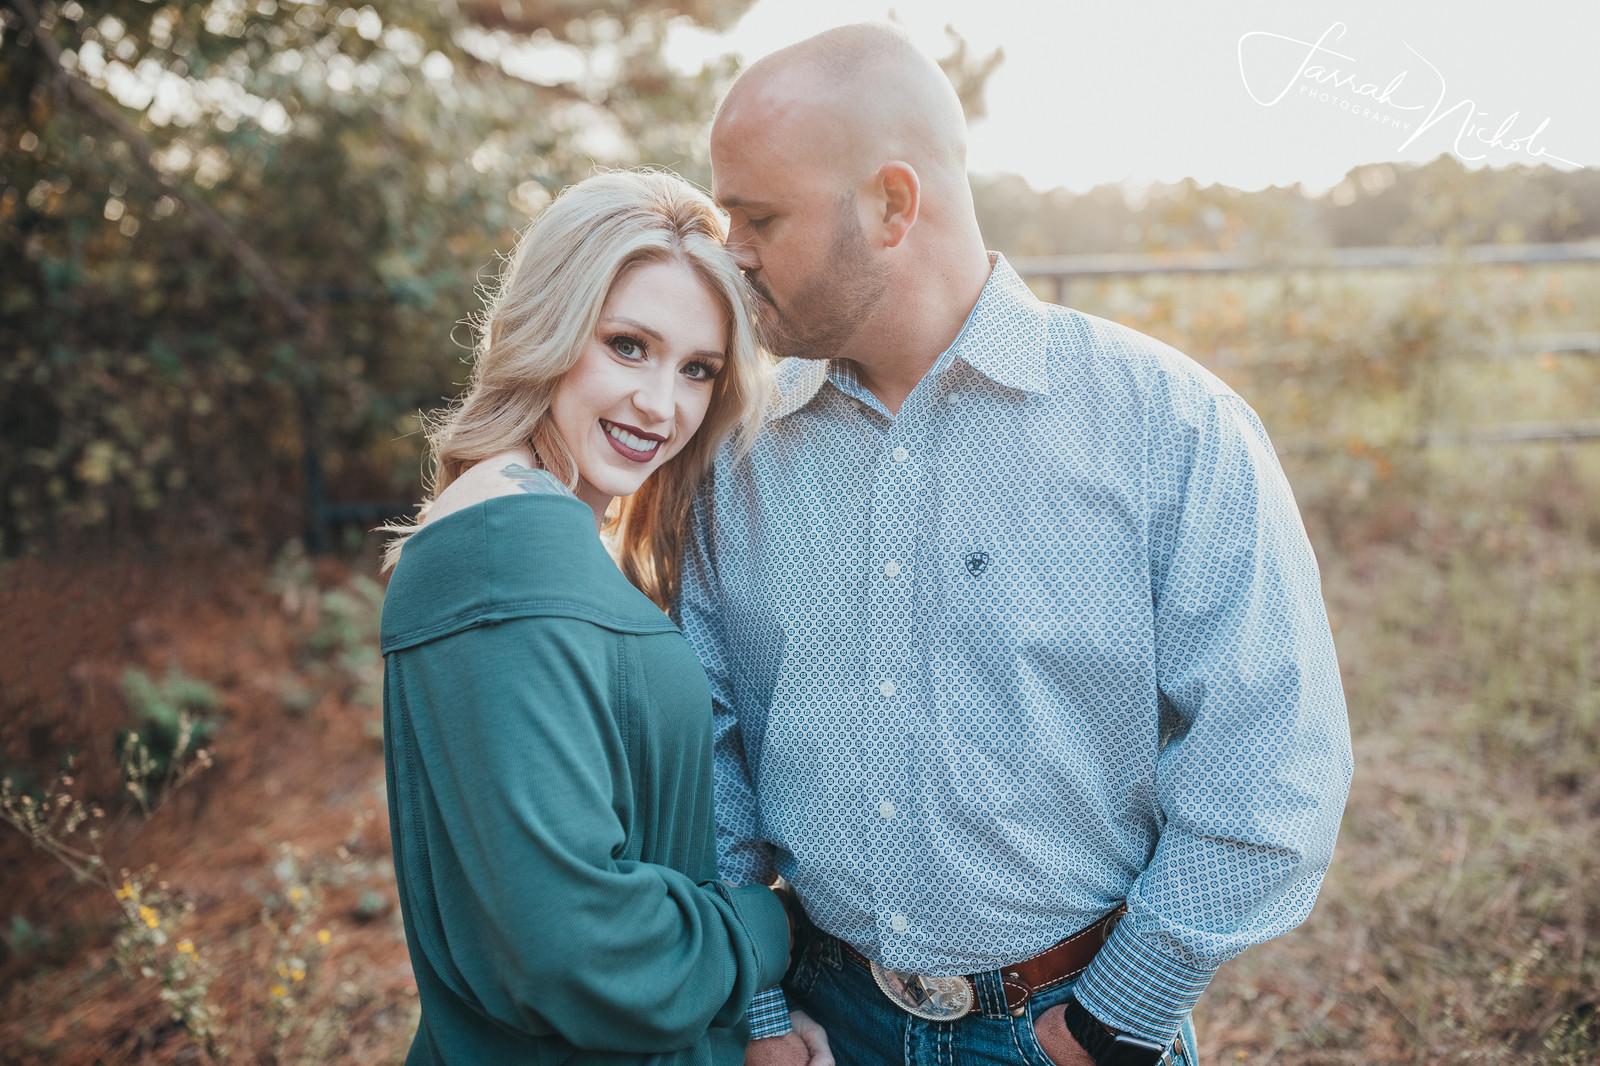 Longview Texas dating